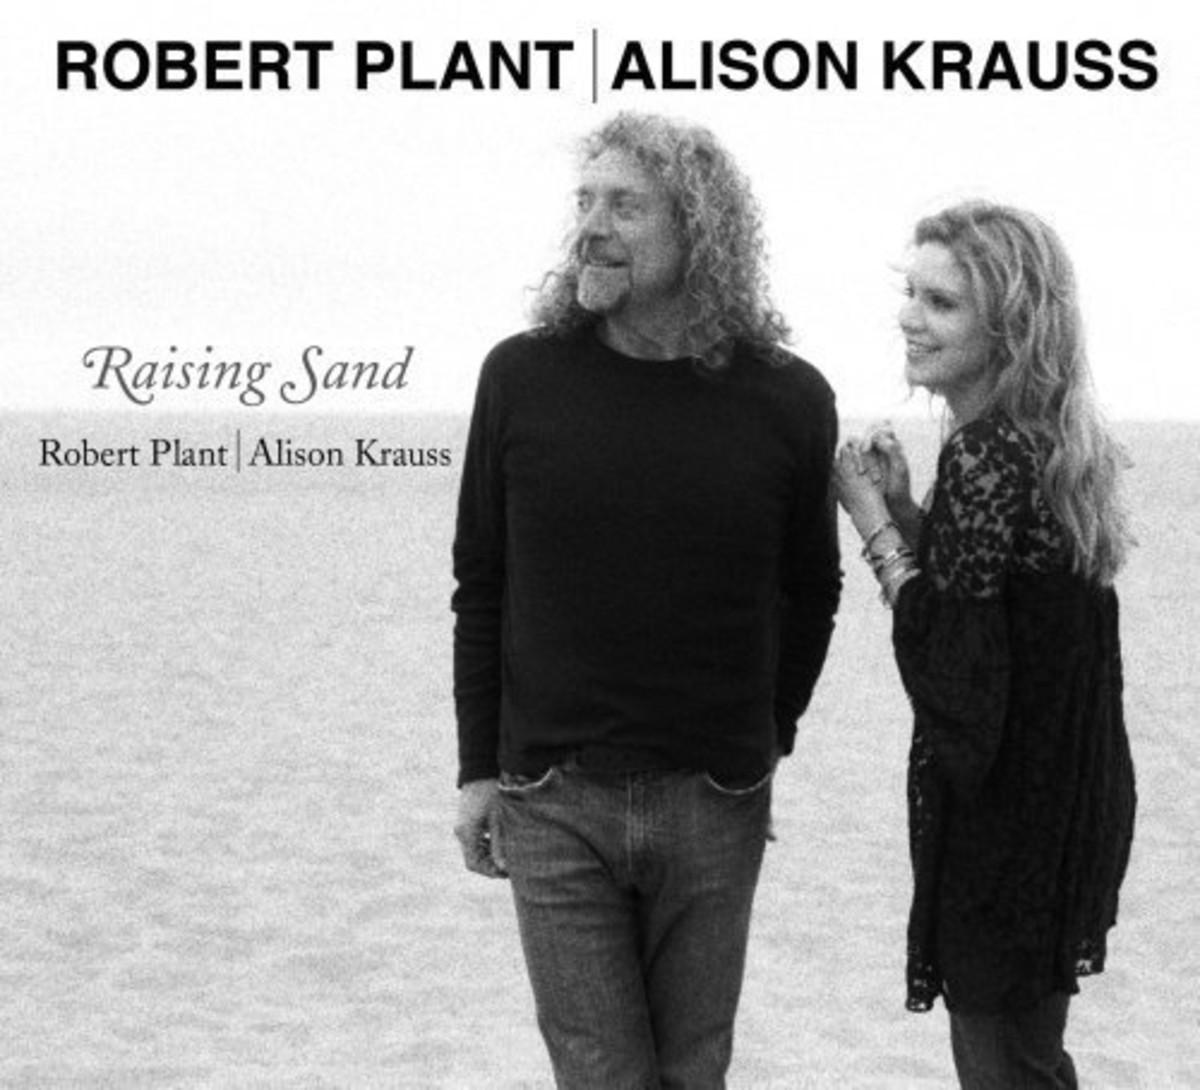 Robert Plant and Alison Krauss, Raising Sand